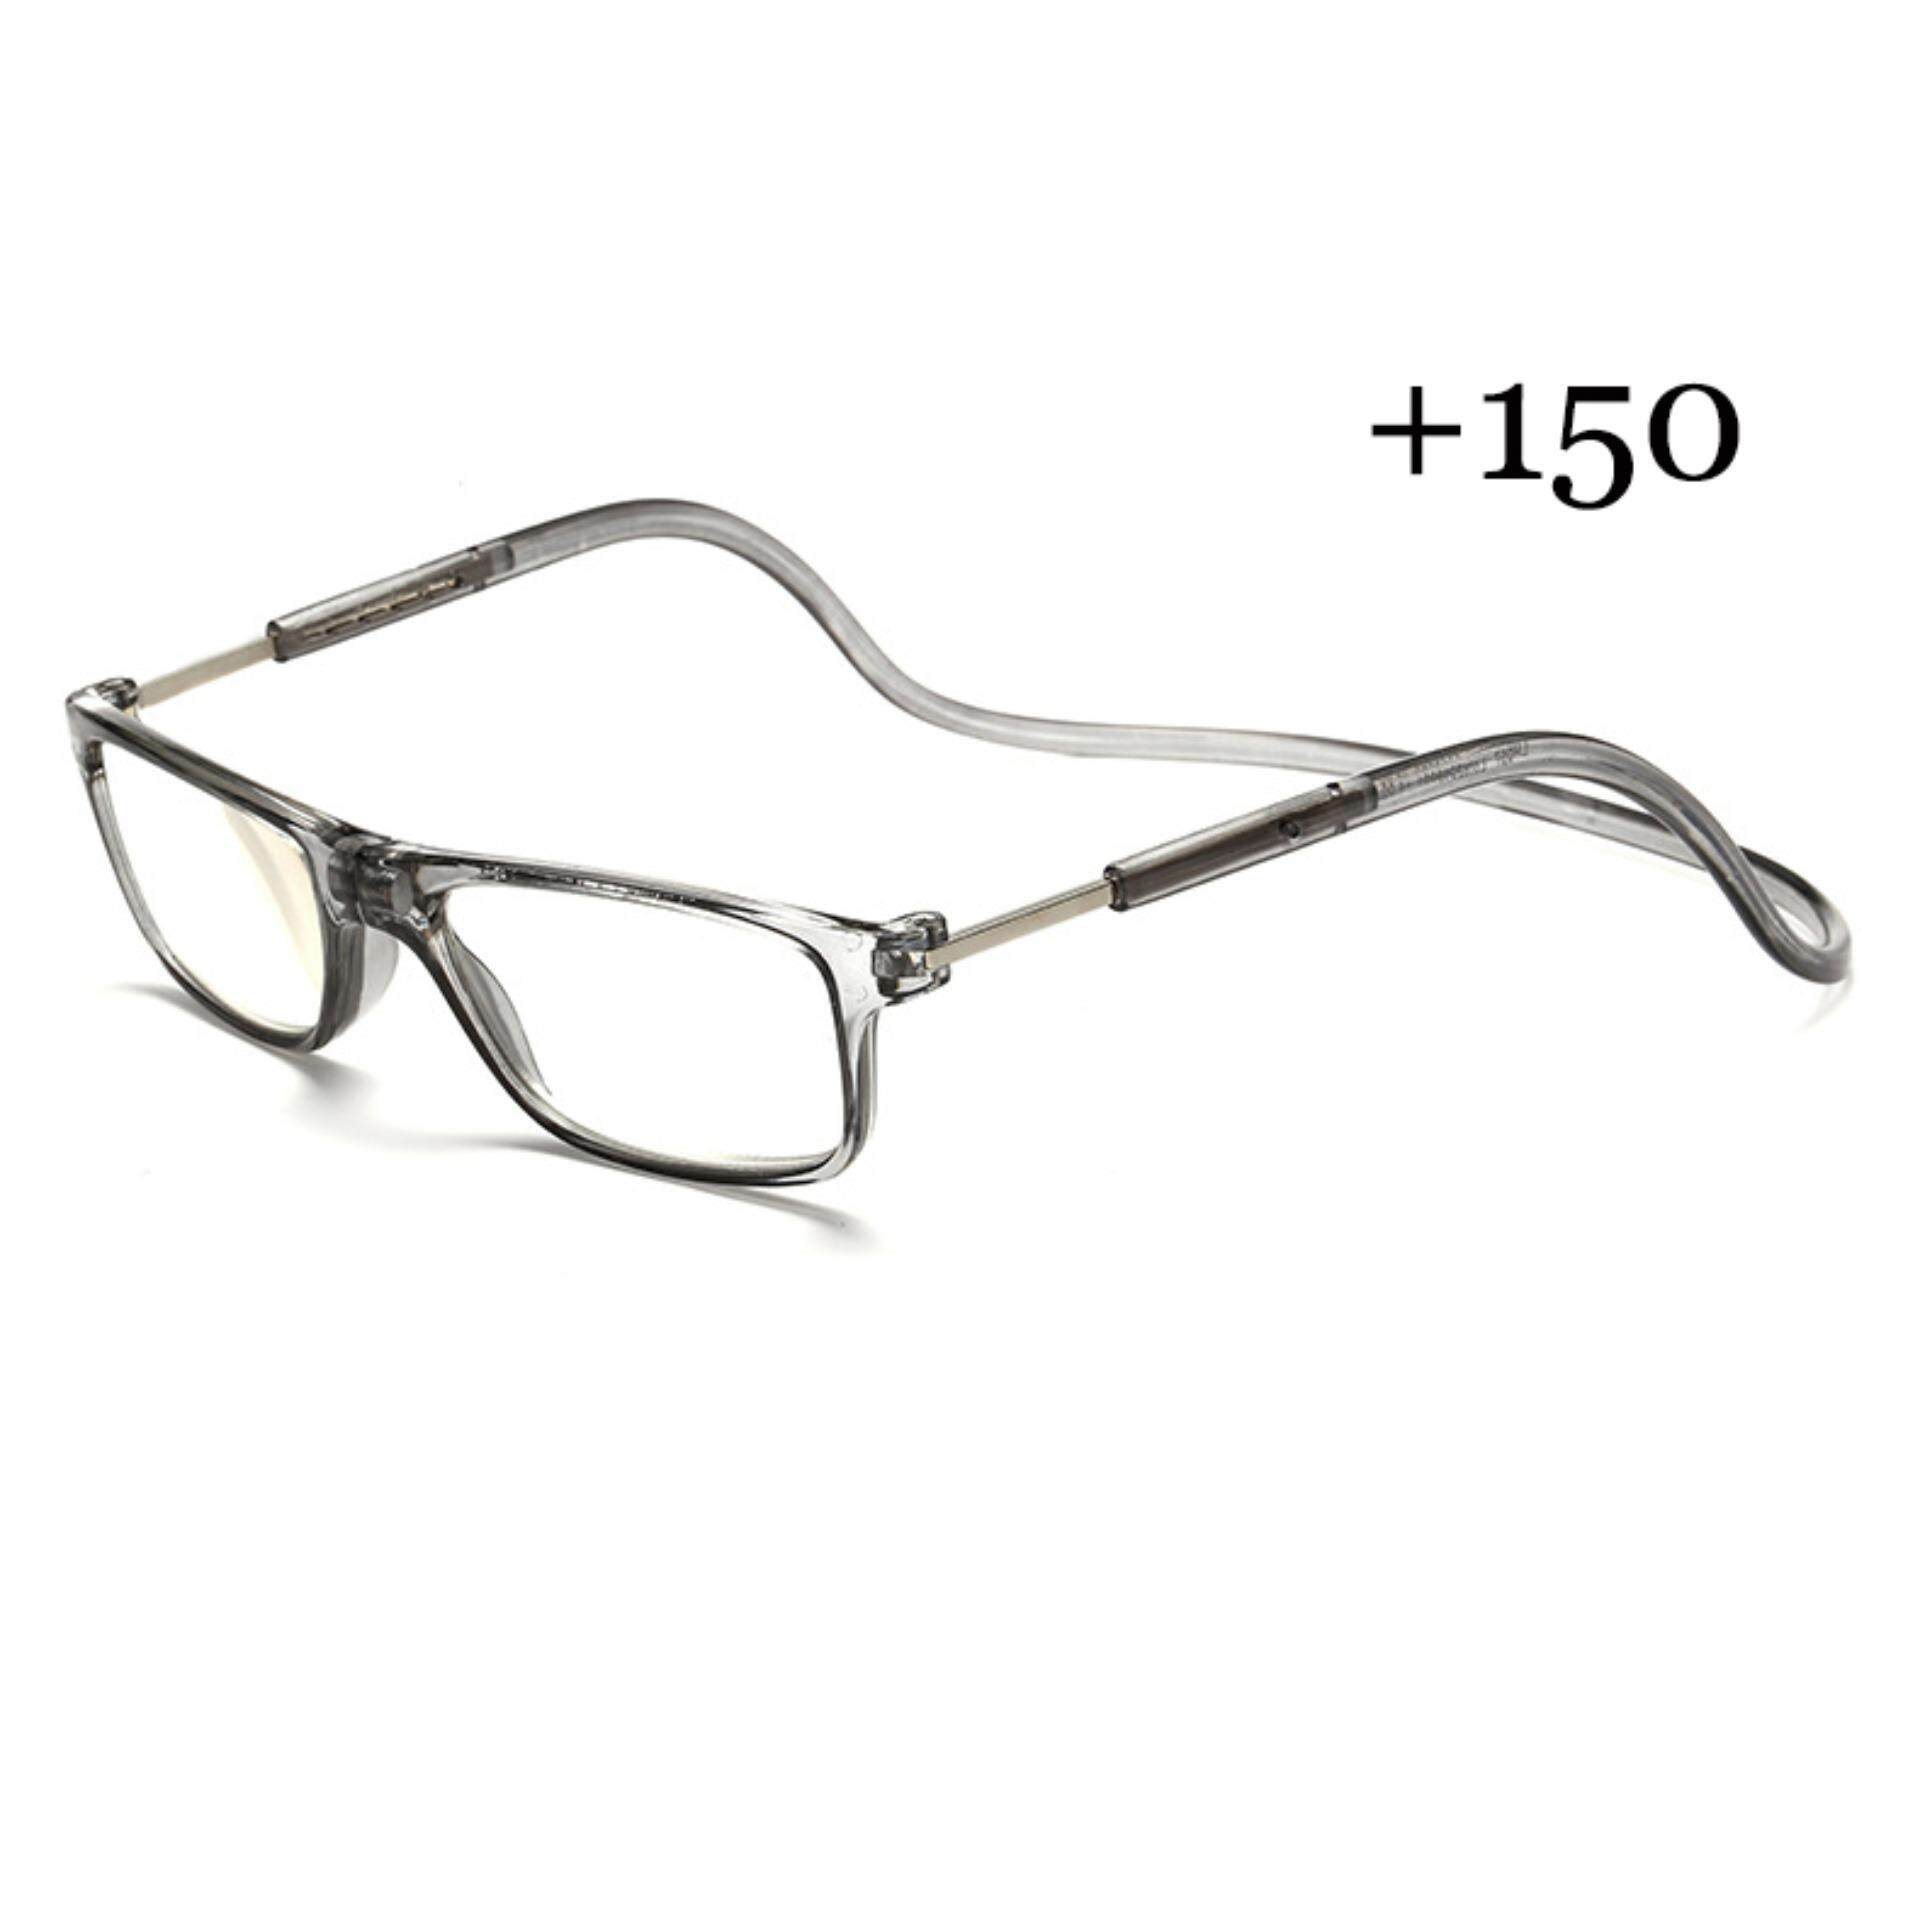 e4069e7eb4 Magnetic Reading Glasses Click Adjustable Reading Eyeglasses Hanging Rim  Grey 150